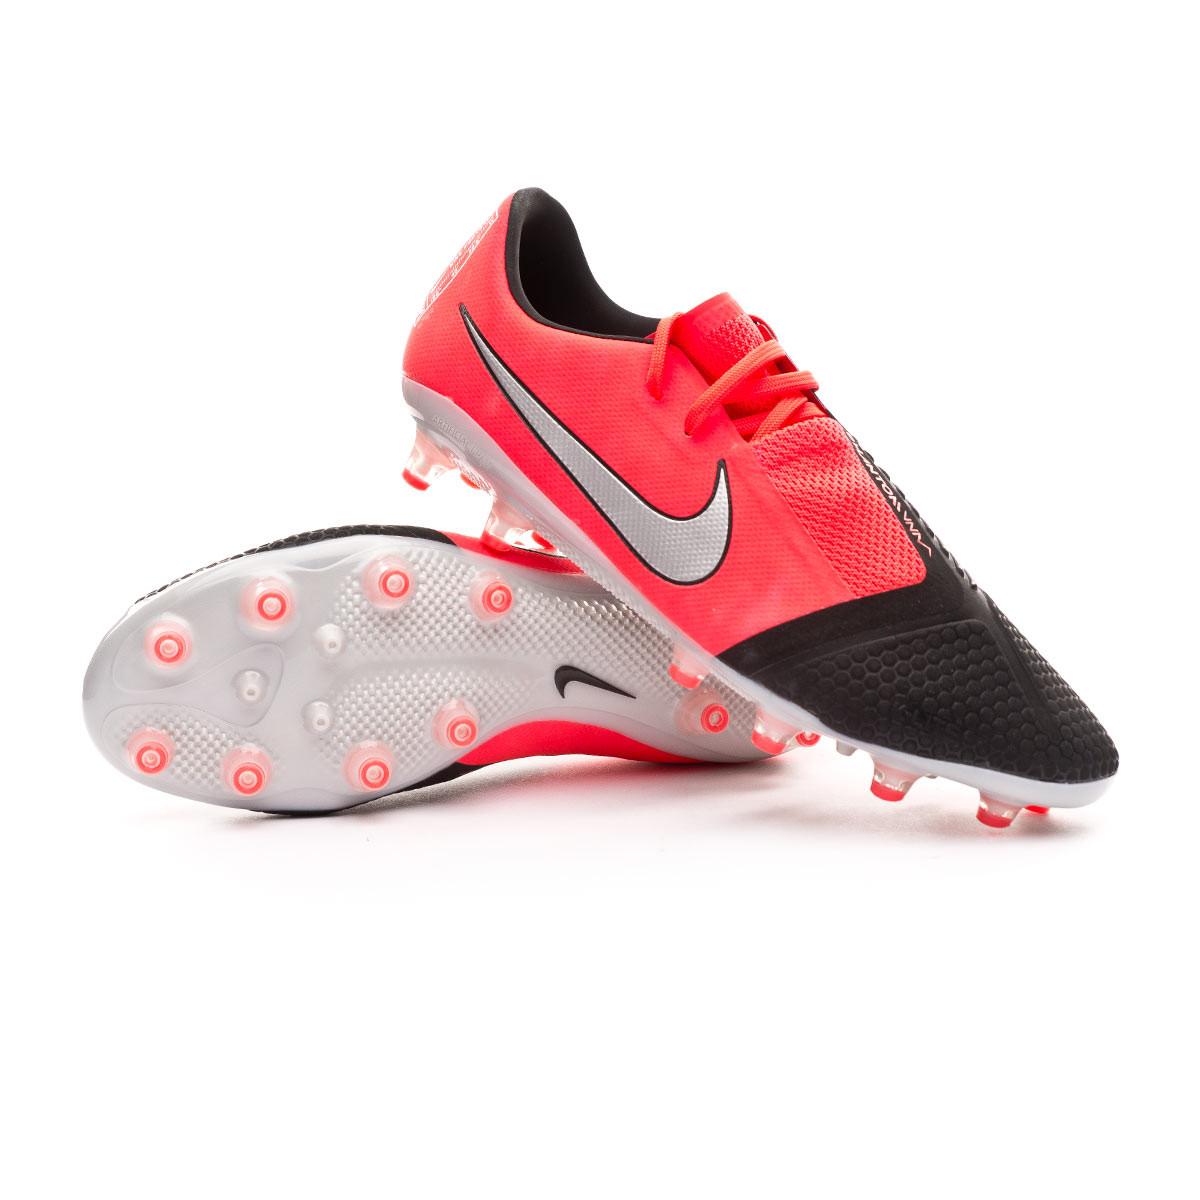 Horizontal Juguetón siesta  Football Boots Nike Phantom Venom Pro AG-PRO Laser crimson-Metallic  silver-Black - Football store Fútbol Emotion